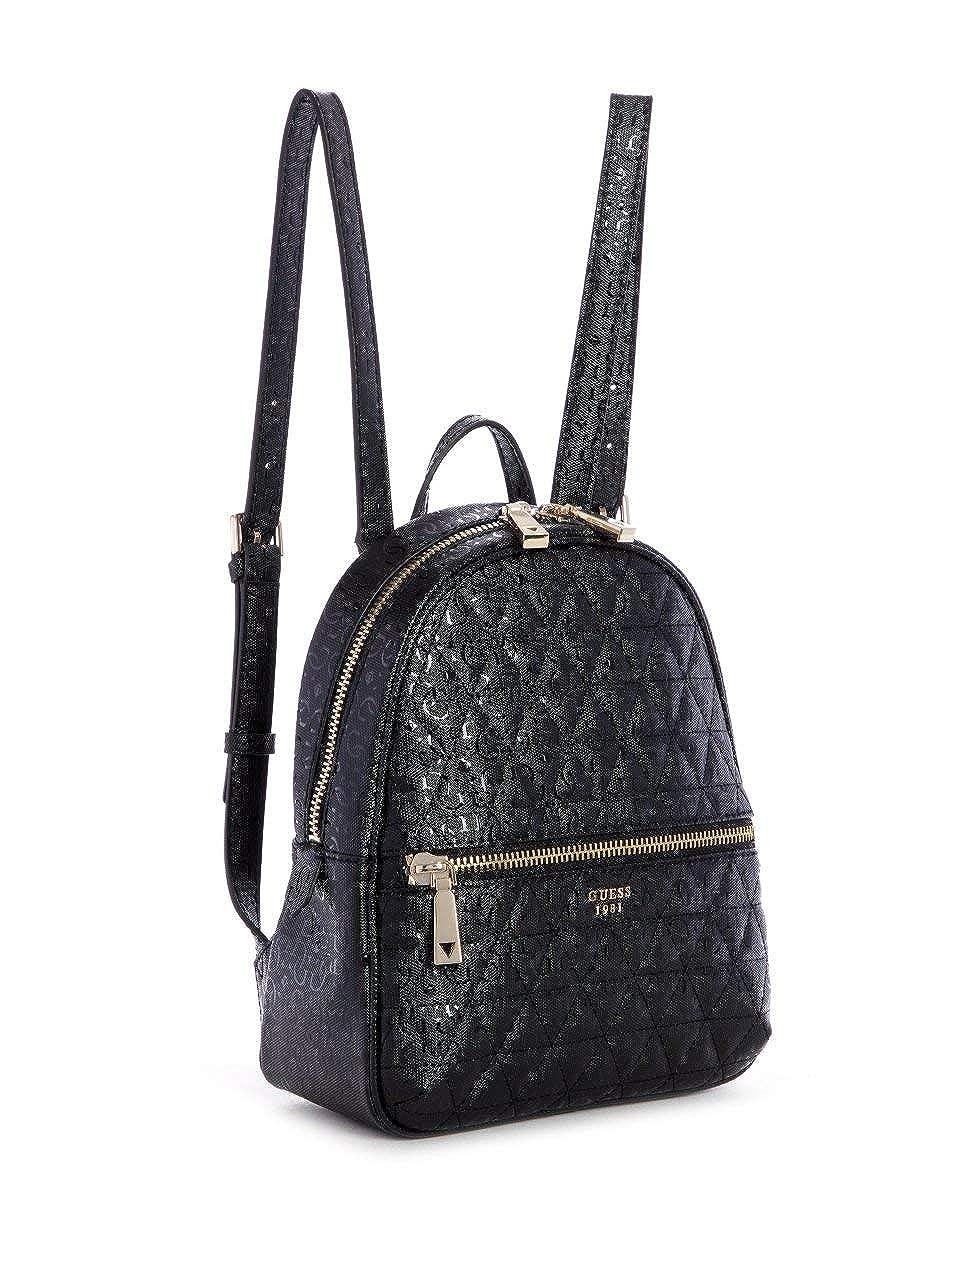 Guess, TABBI BACKPACK BLACK HWSG71 81320 Rucksackhandtaschen für Frauen